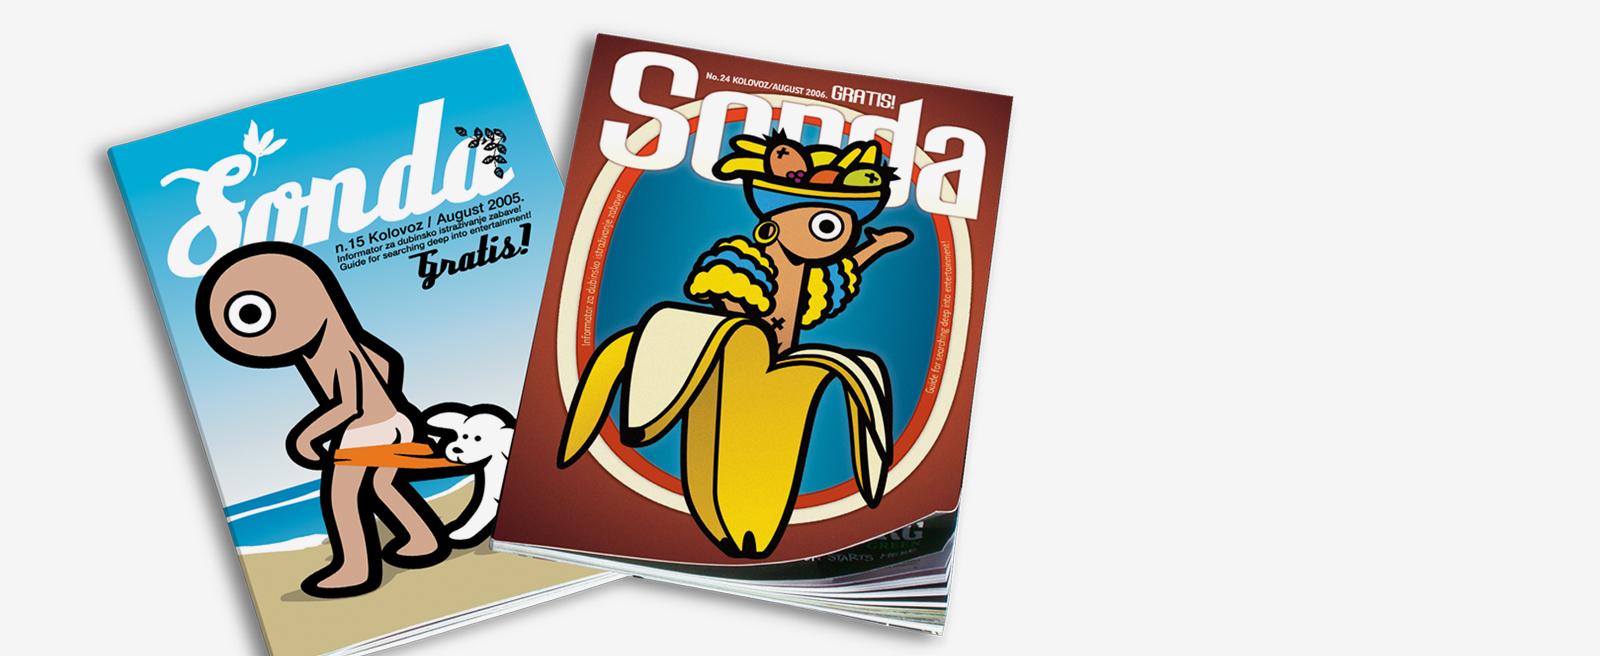 Sonda Magazine